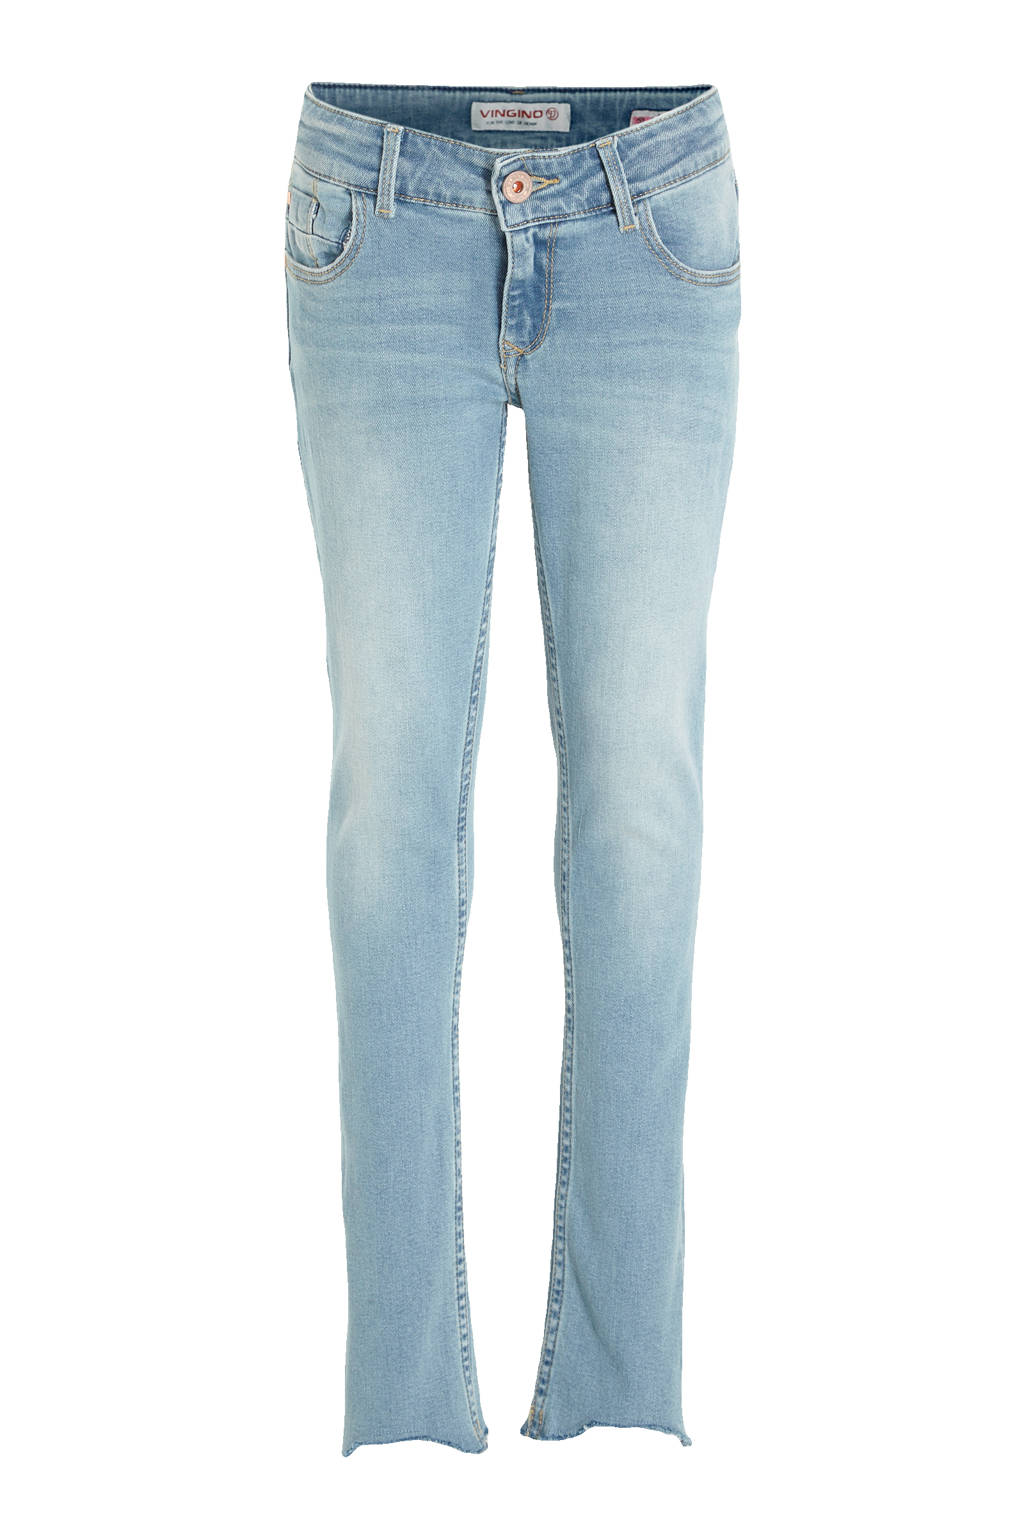 Vingino cropped high waist skinny jeans Amia Cropped light indigo, Light Indigo